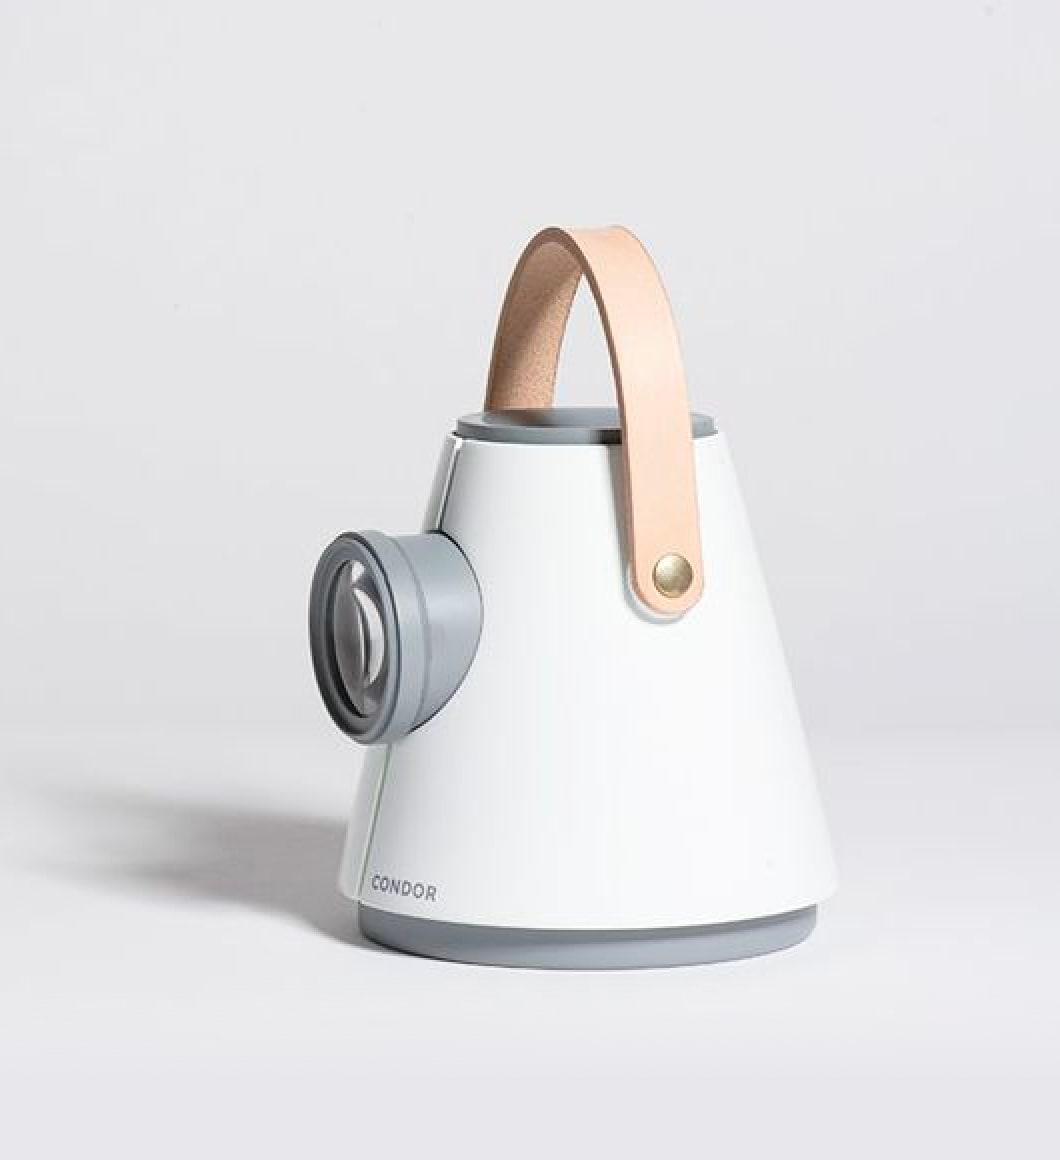 Onbio Bluetooth Headphones, Noise Cancelling Headphones